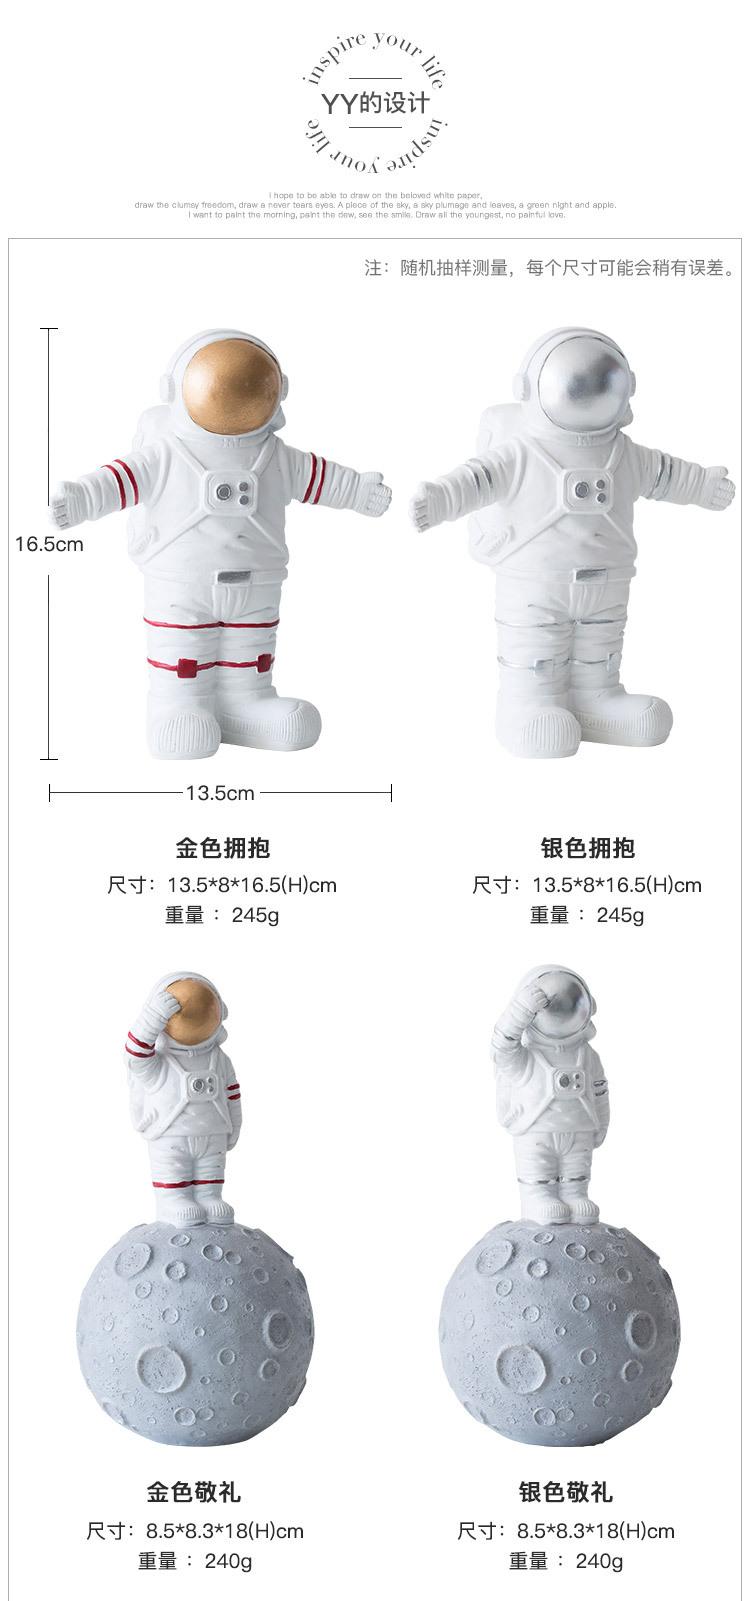 1I820020 Astronaut Figurine Resin Wholesale Online (16)